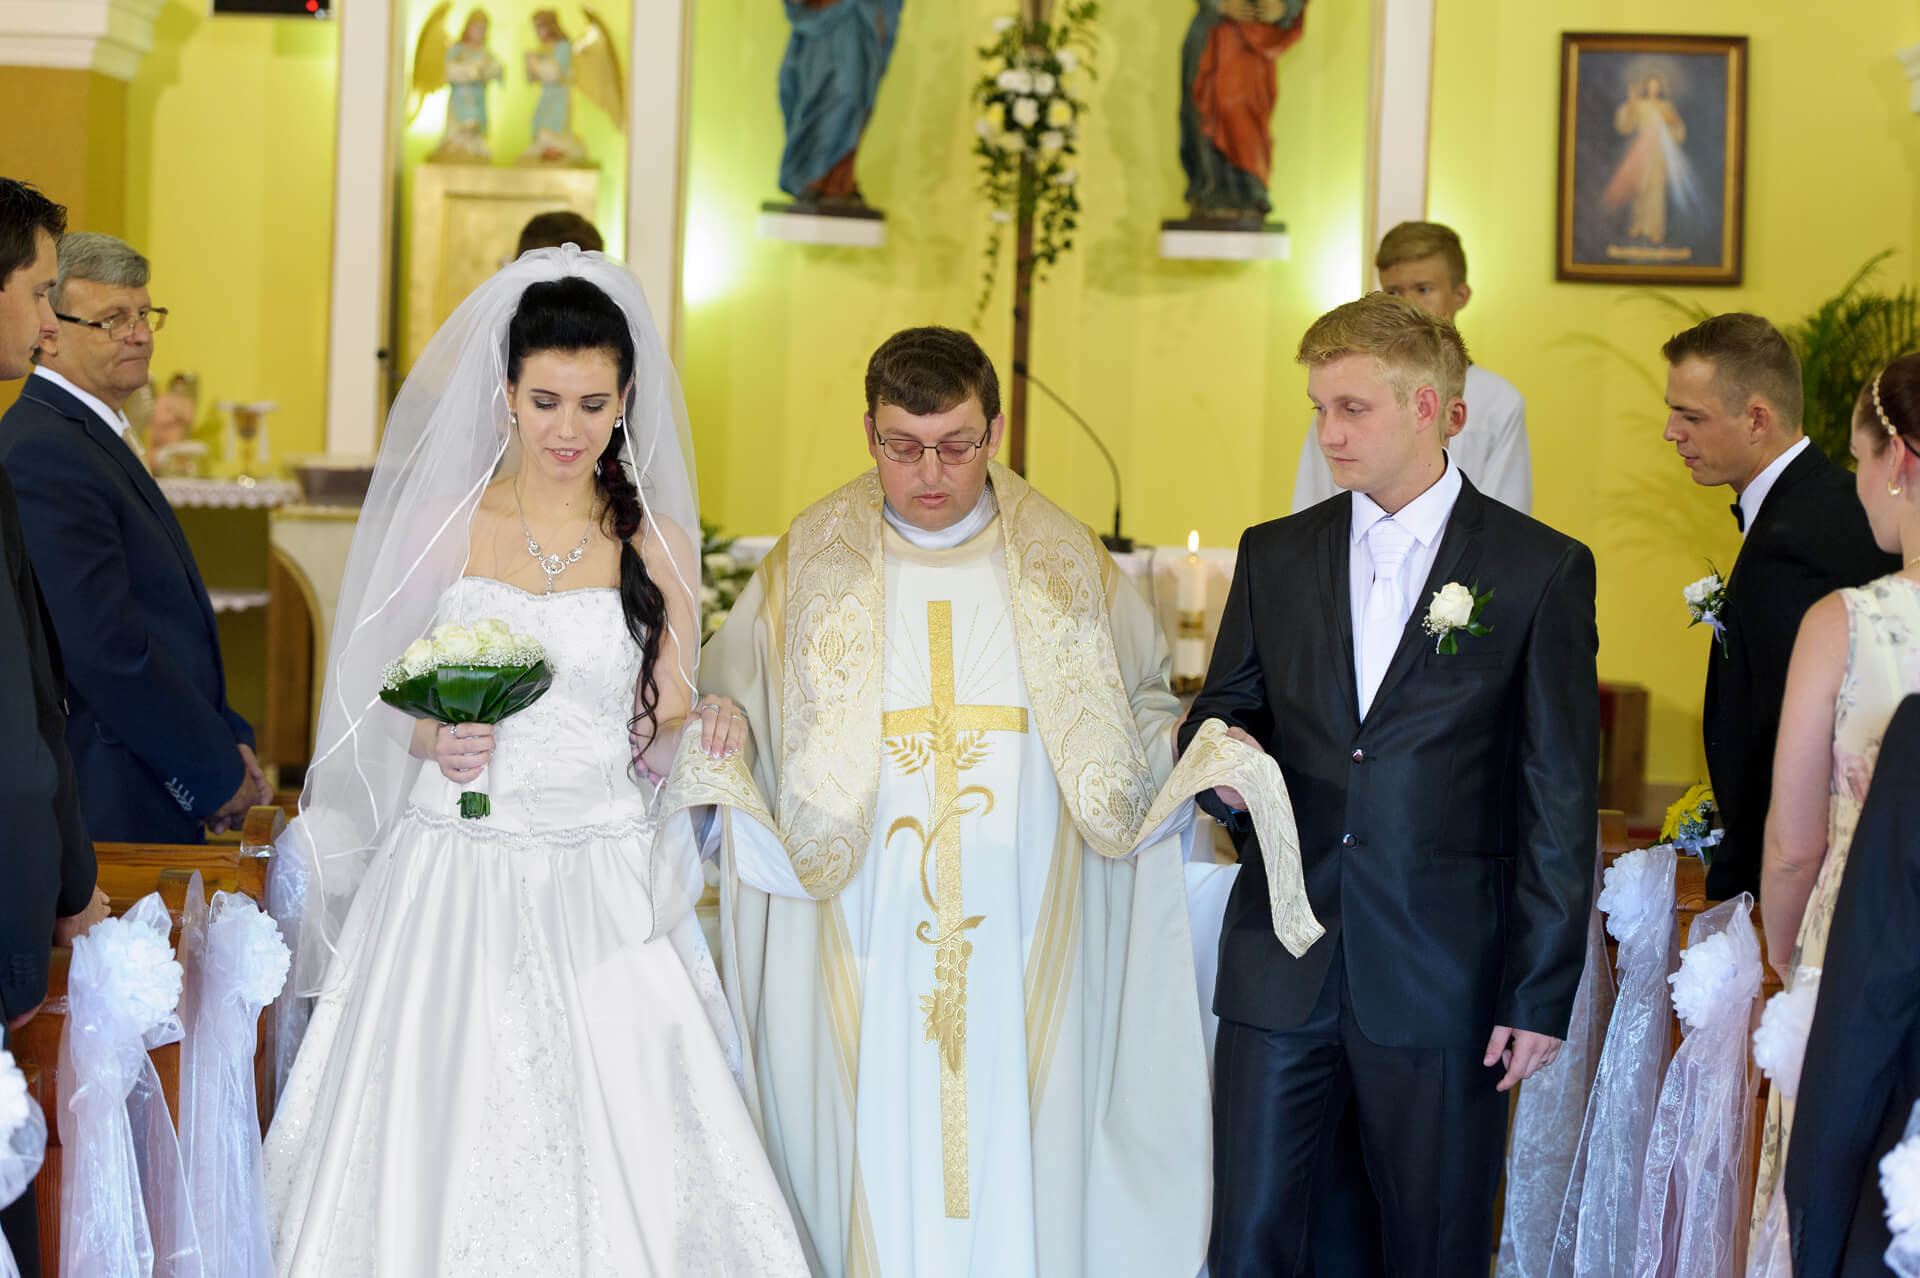 svadba svadobny kostol obrad profesionalne fotenie fotograf Peter Norulak Kosice__15